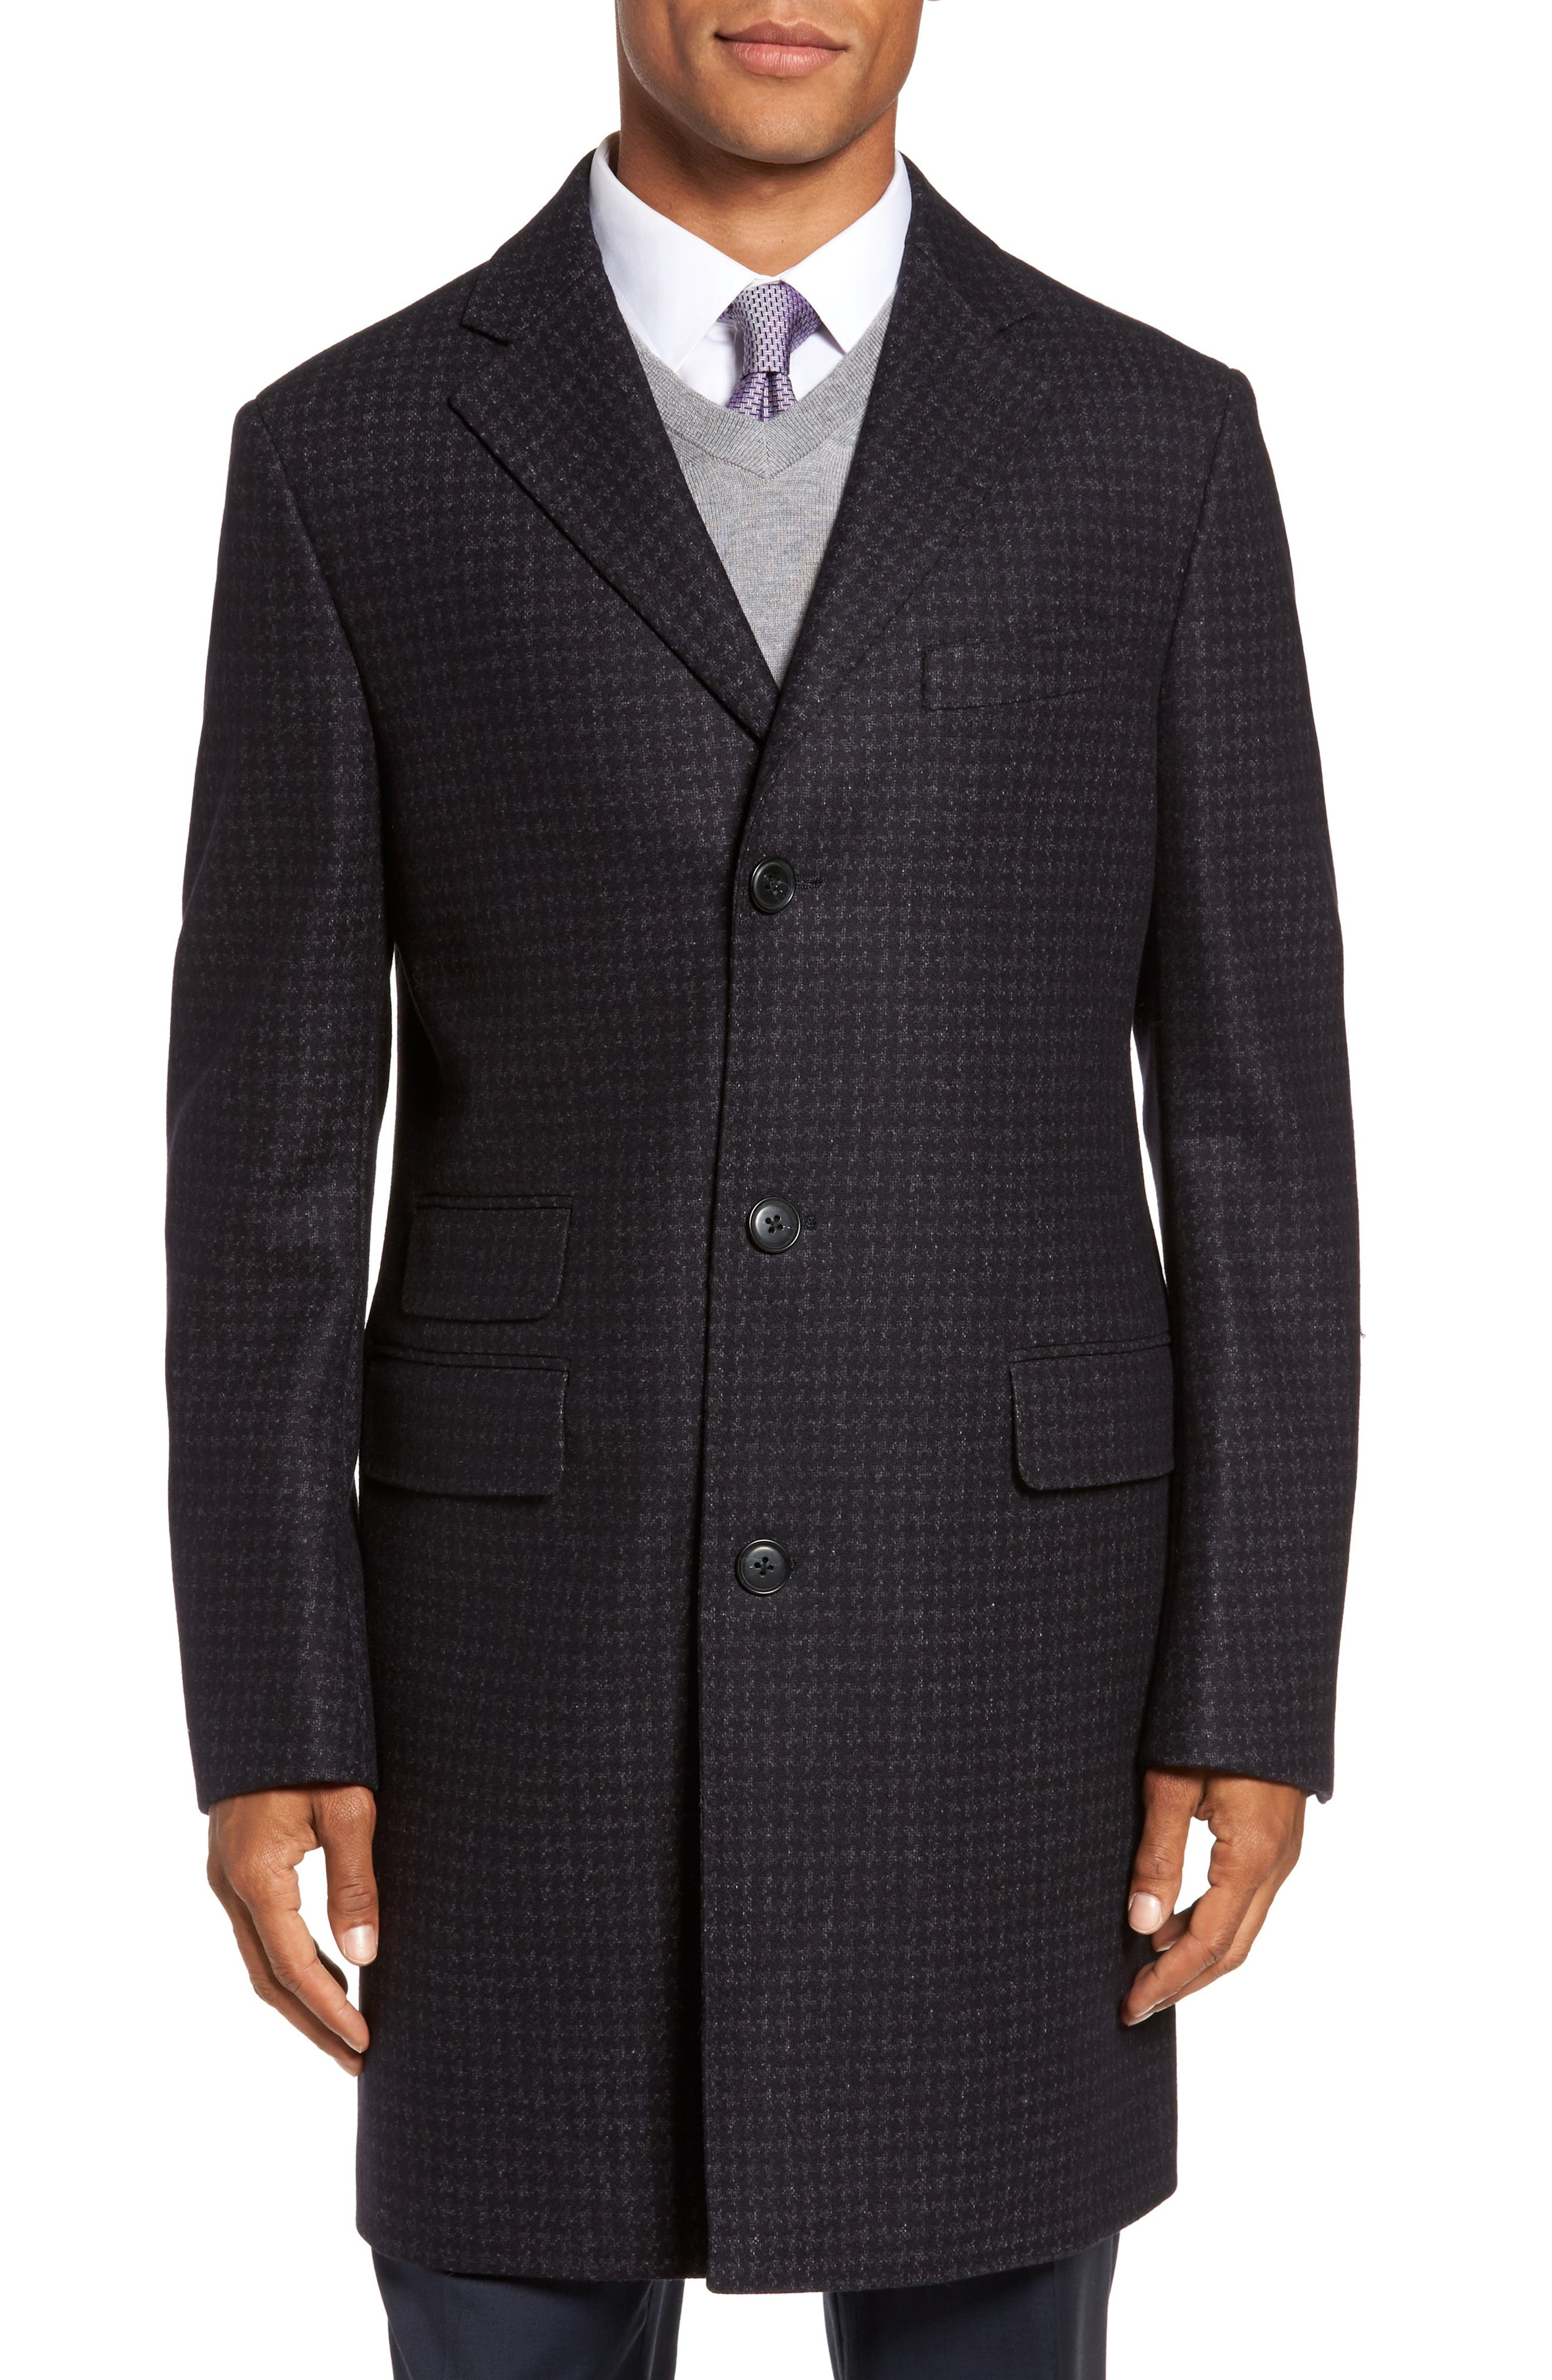 Jackson Houndstooth Wool Blend Overcoat,                             Alternate thumbnail 4, color,